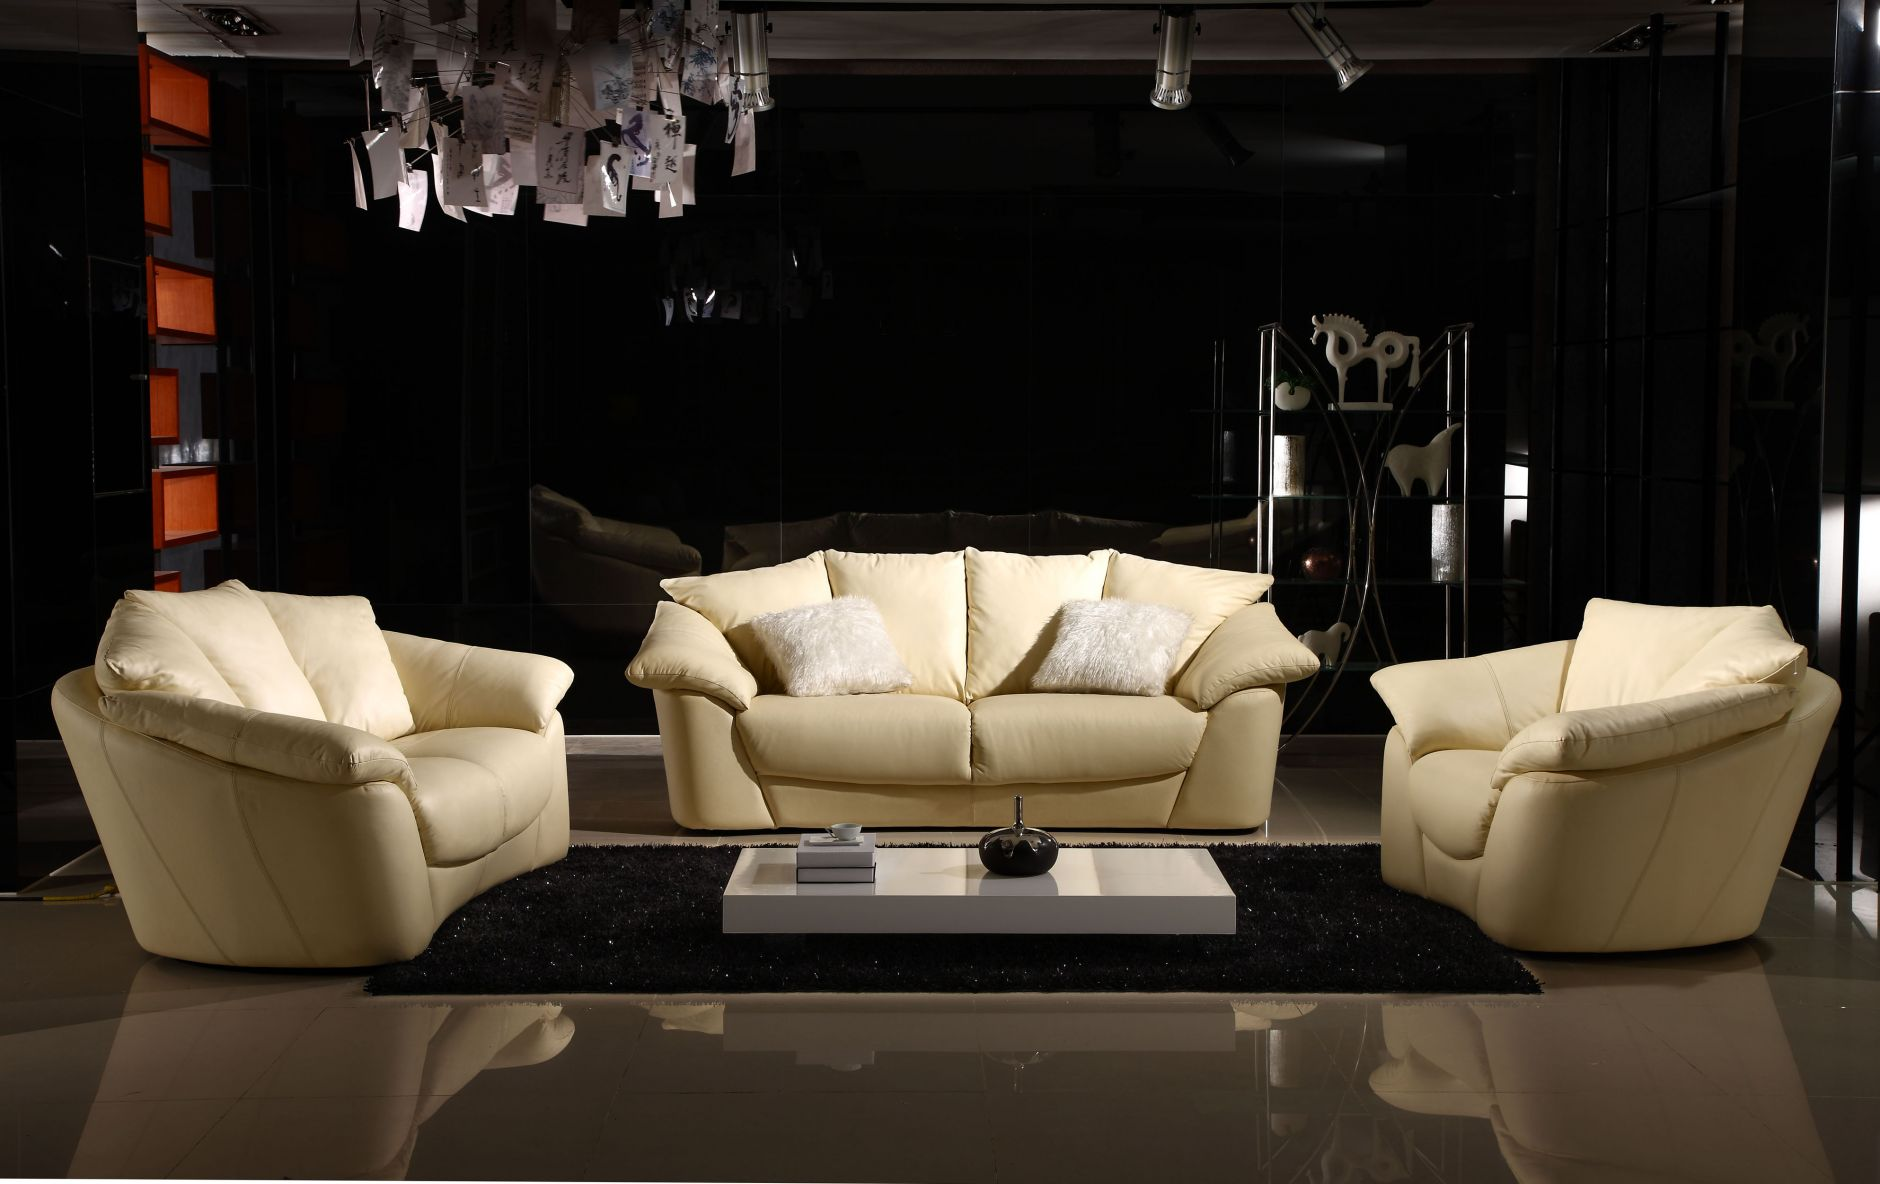 polsterm bel sofas 555bdie m bel aus italien. Black Bedroom Furniture Sets. Home Design Ideas